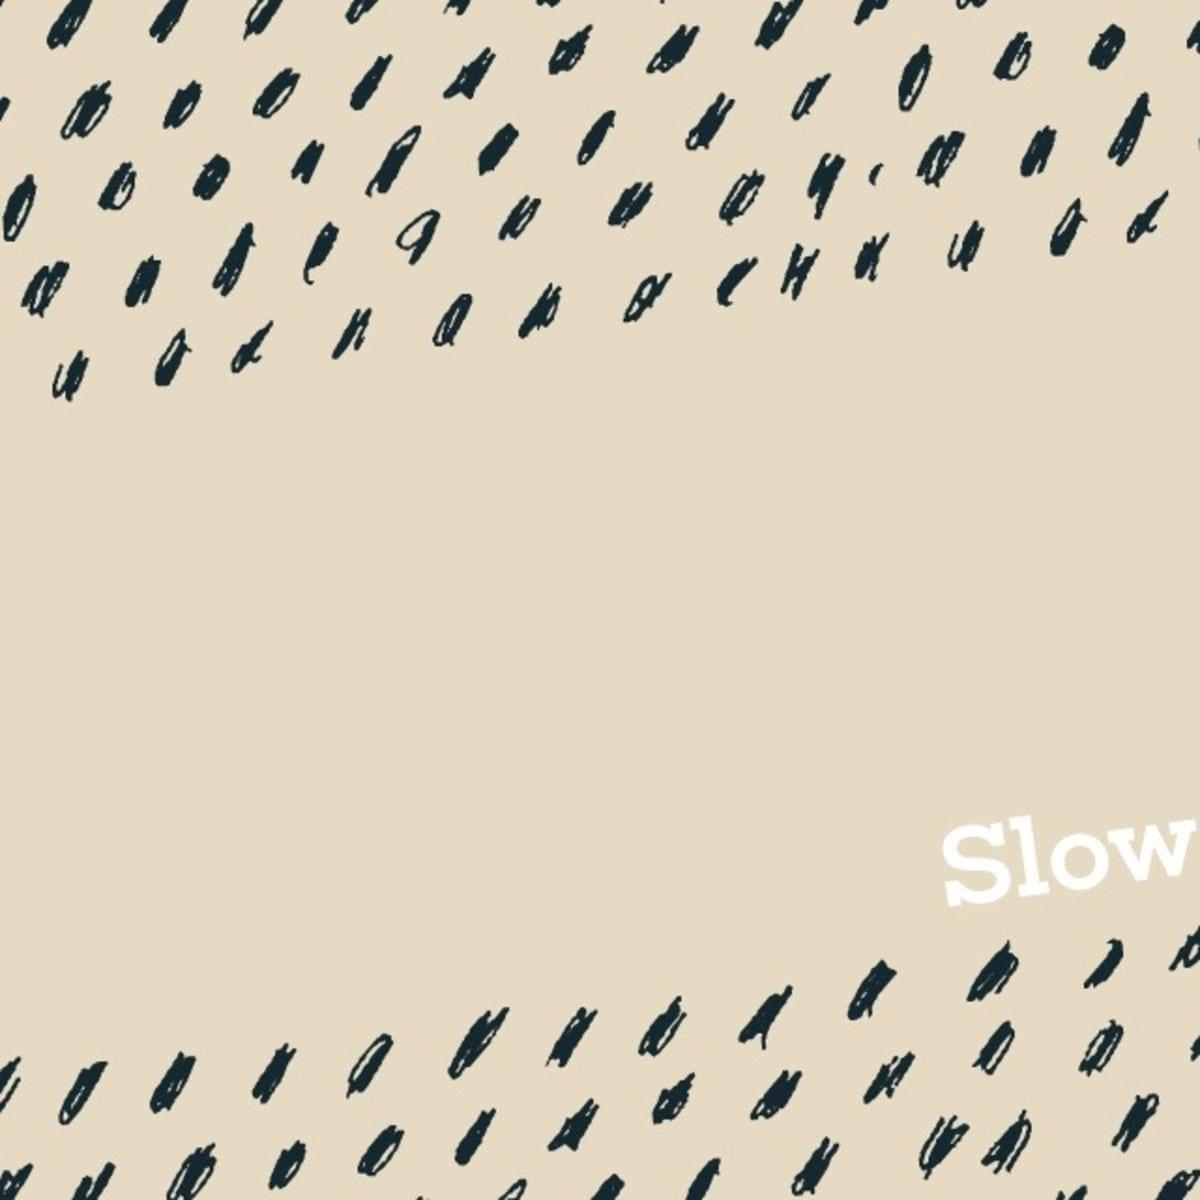 Slowpokes logo